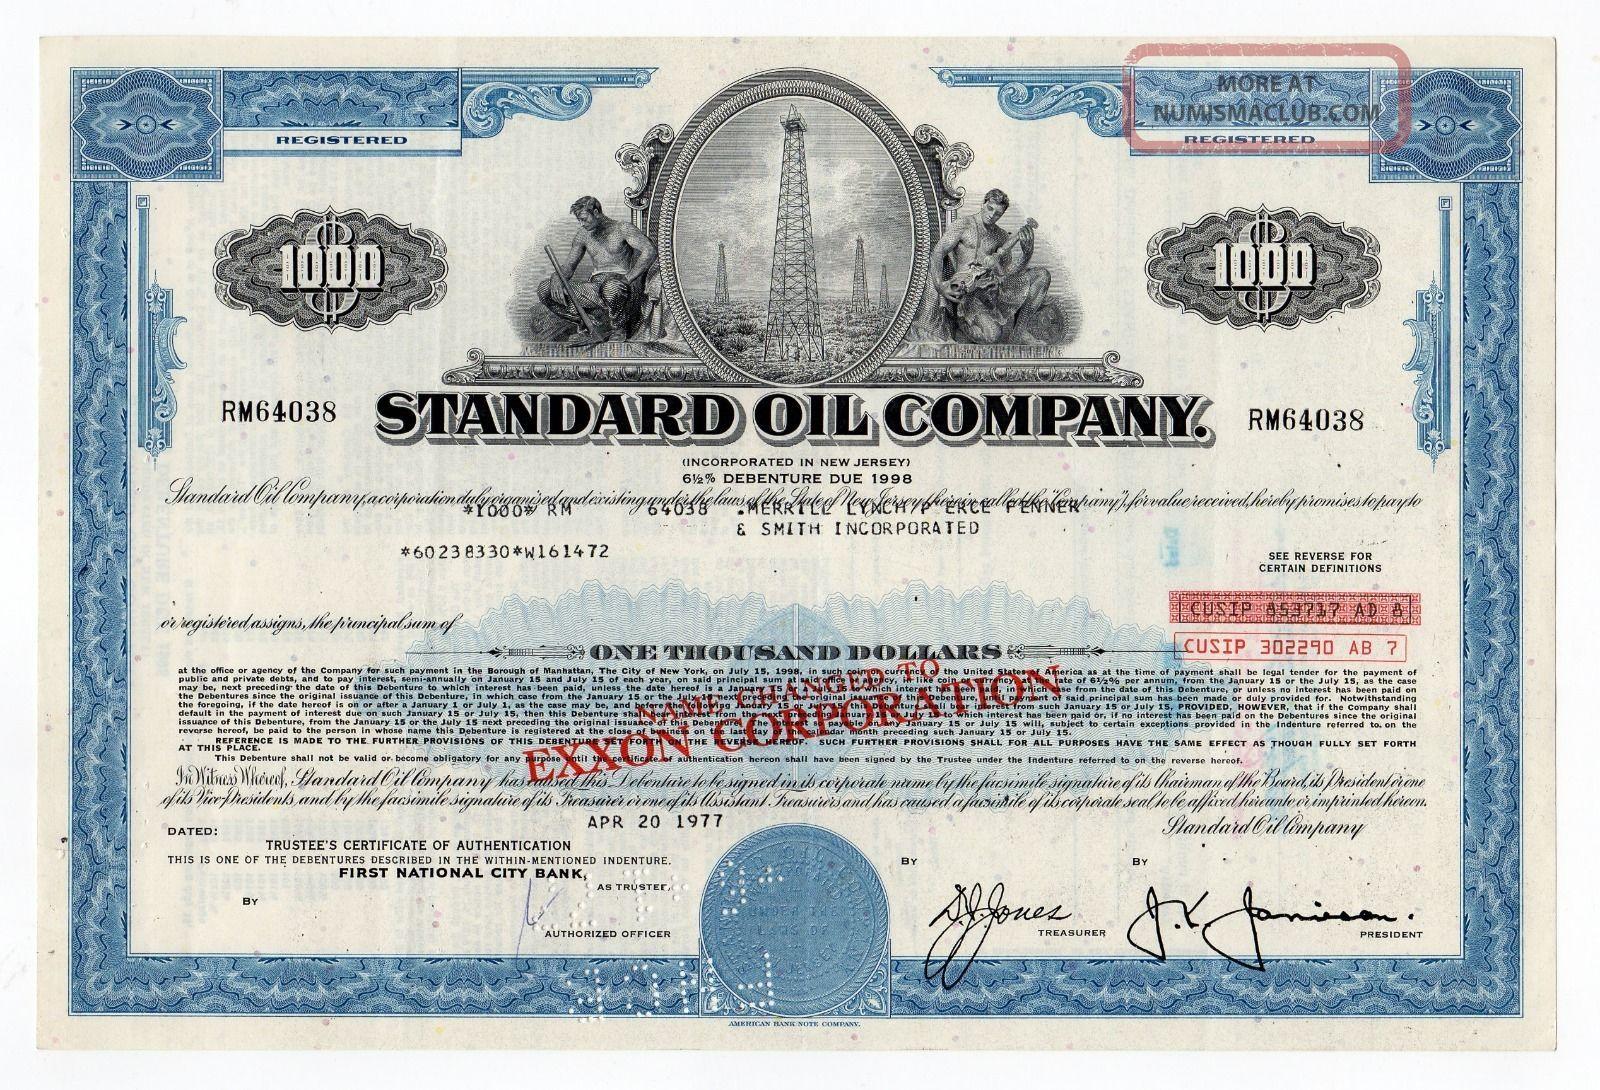 Standard Oil Company Bond W/oil Rig Vignette Stocks & Bonds, Scripophily photo